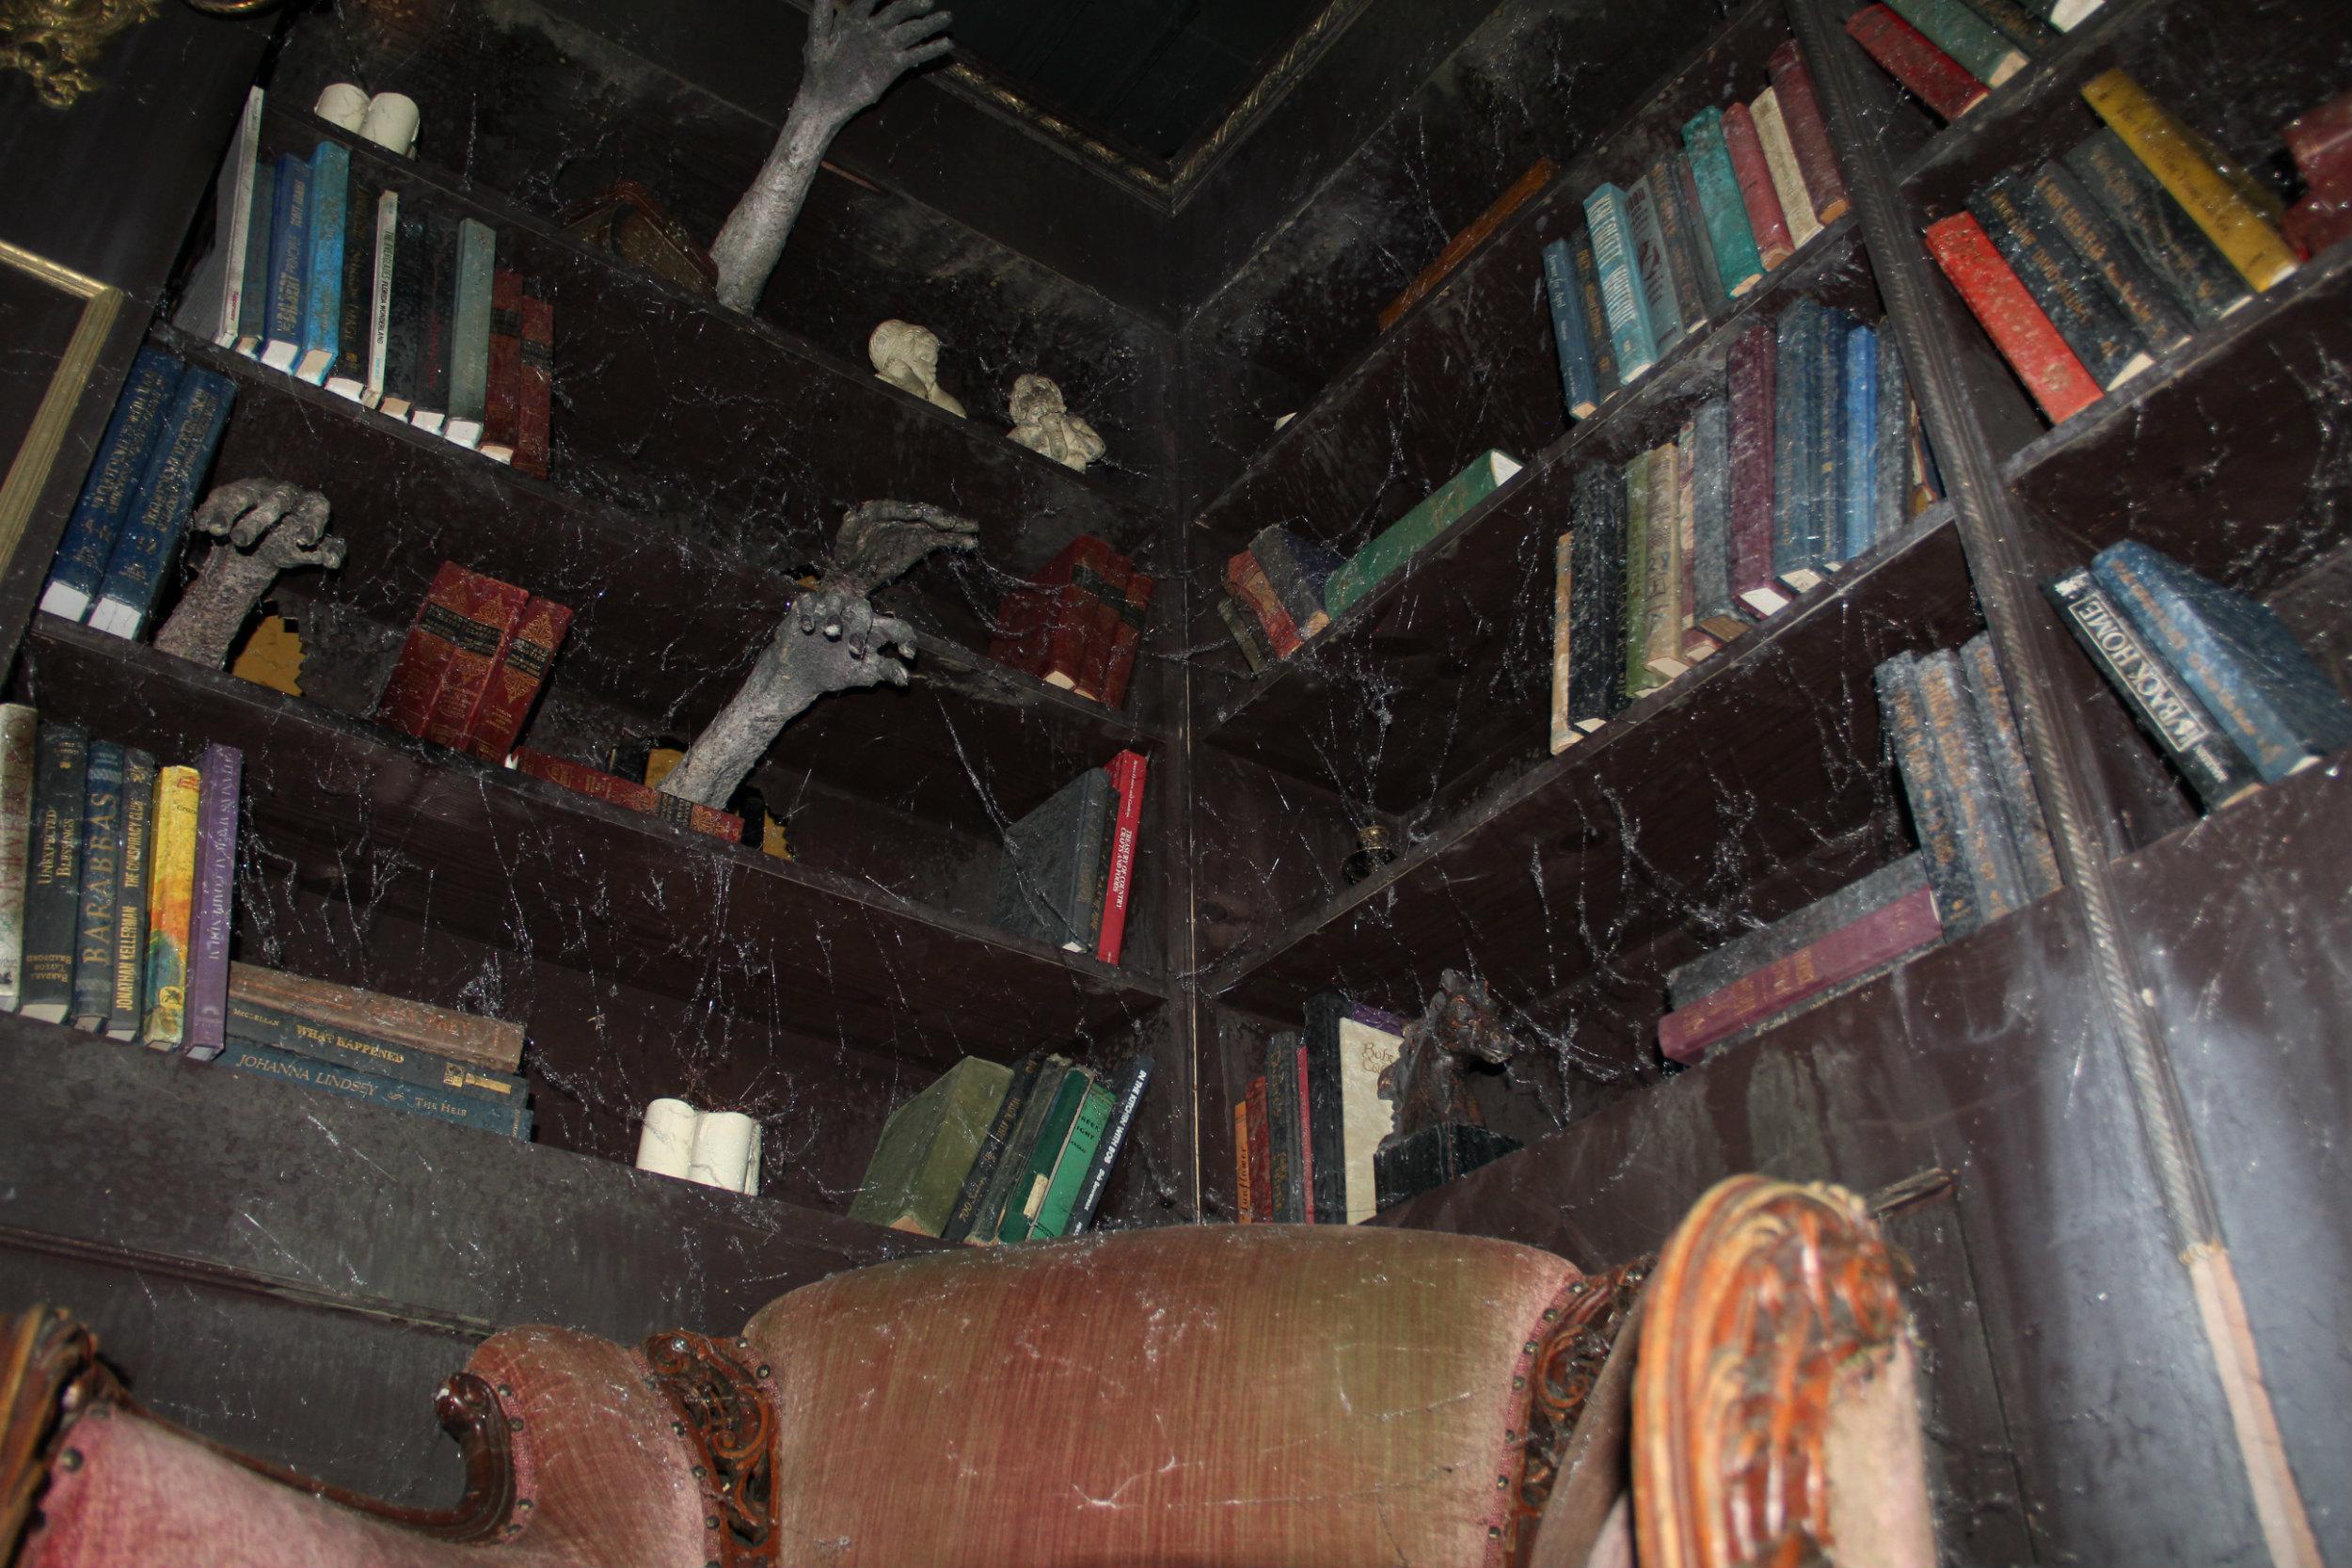 thai-hl-library1.jpg